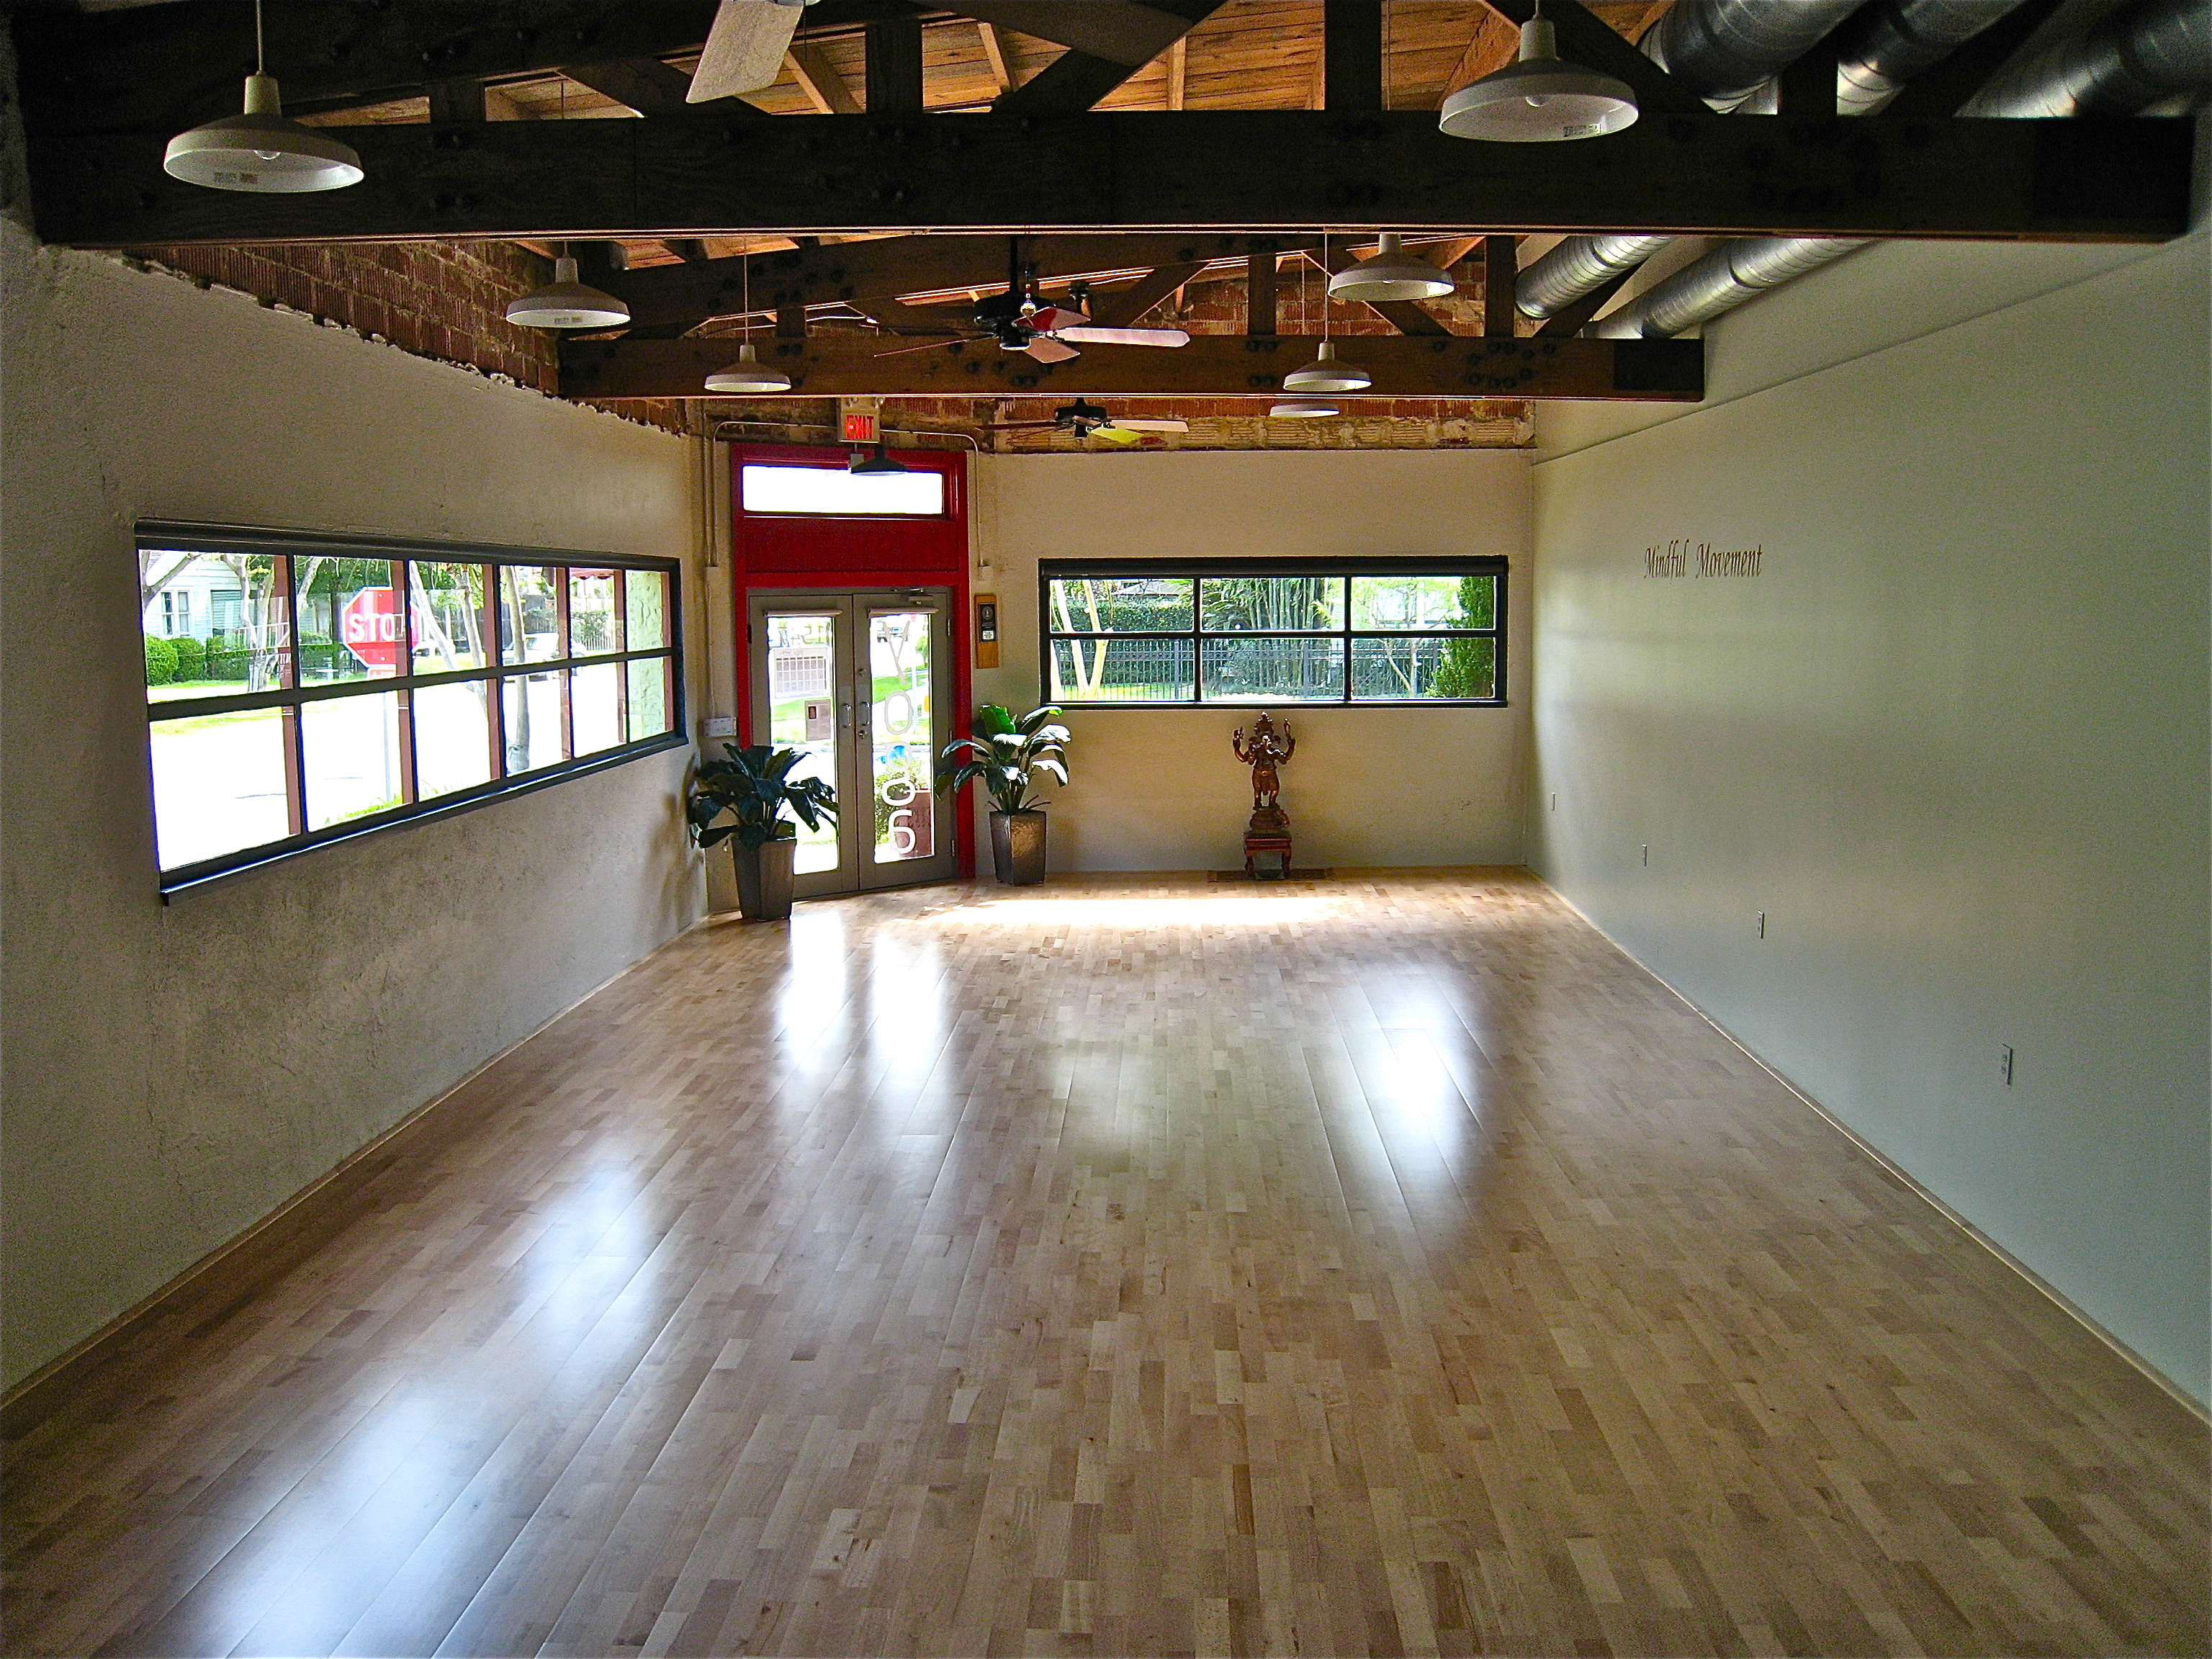 Heights School of Yoga  1547 Rutland St Houston, TX 77008